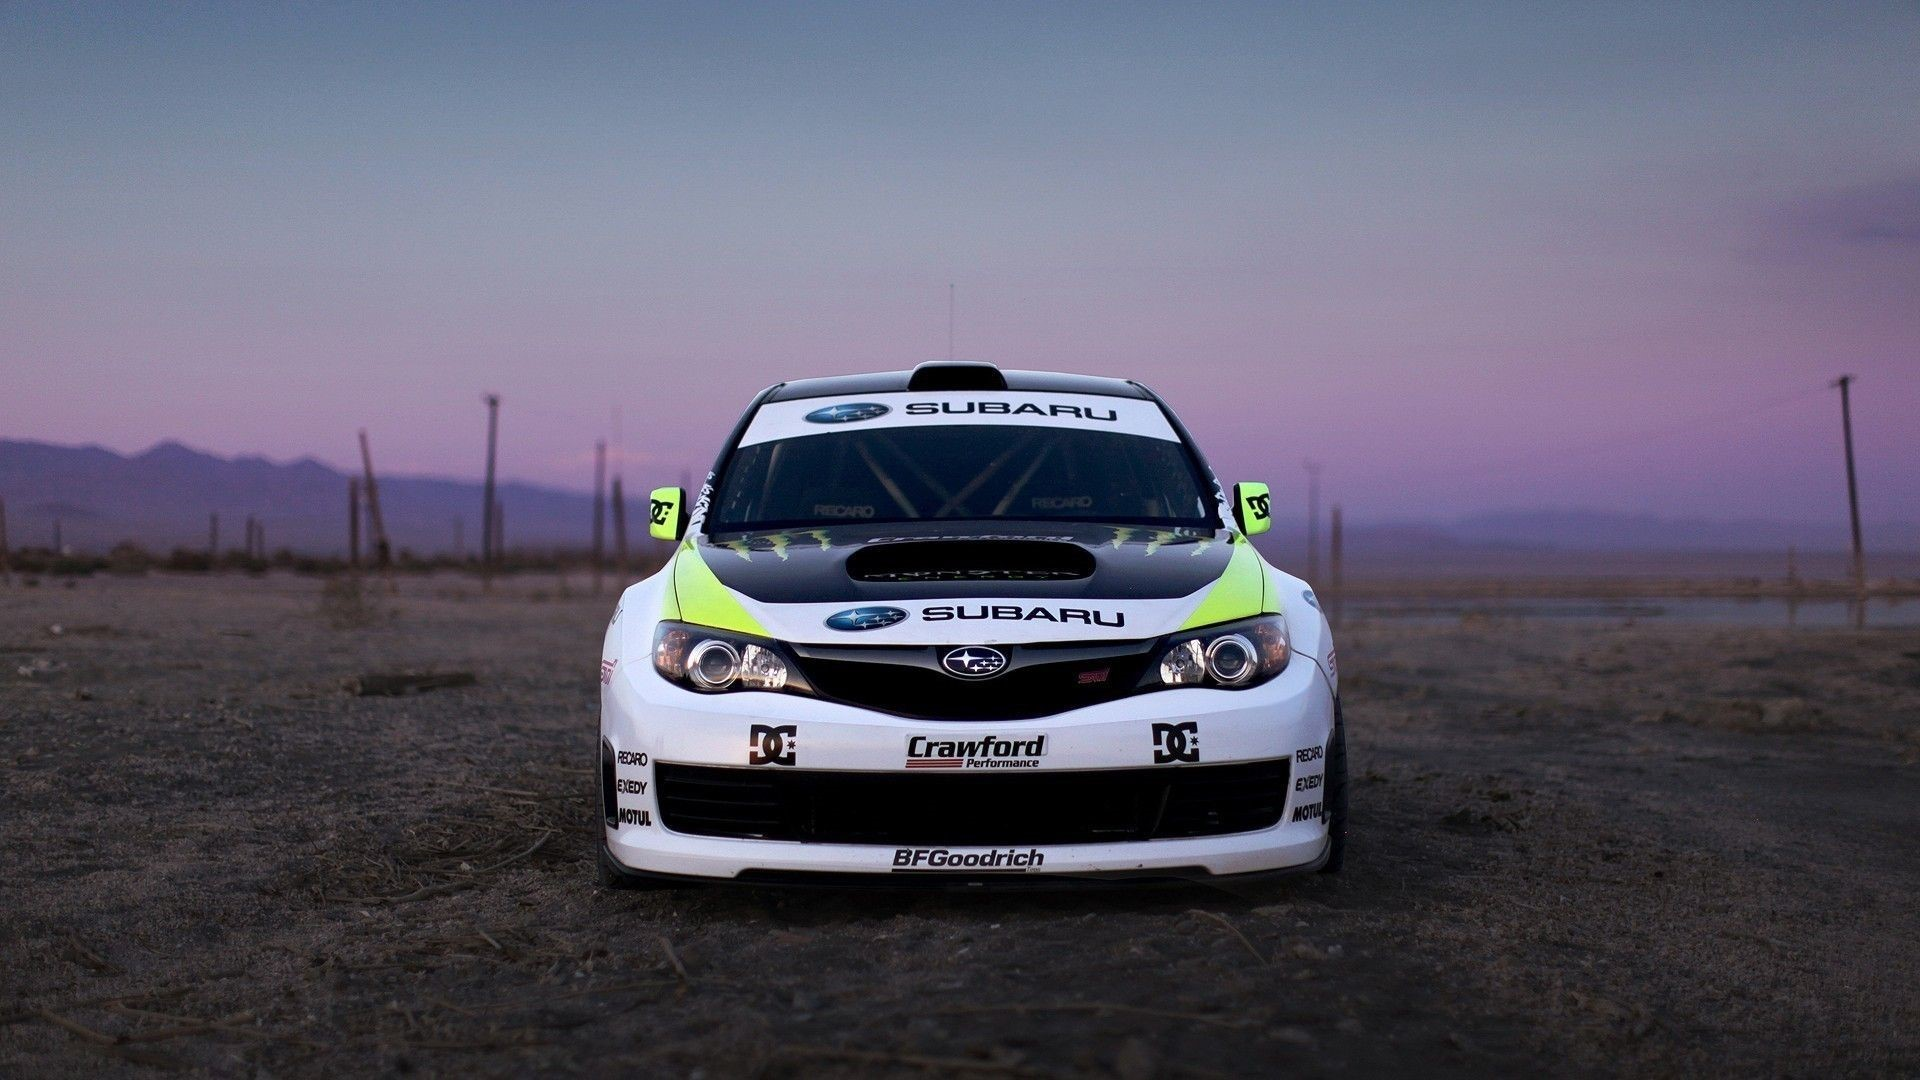 Subaru Rally Car Background